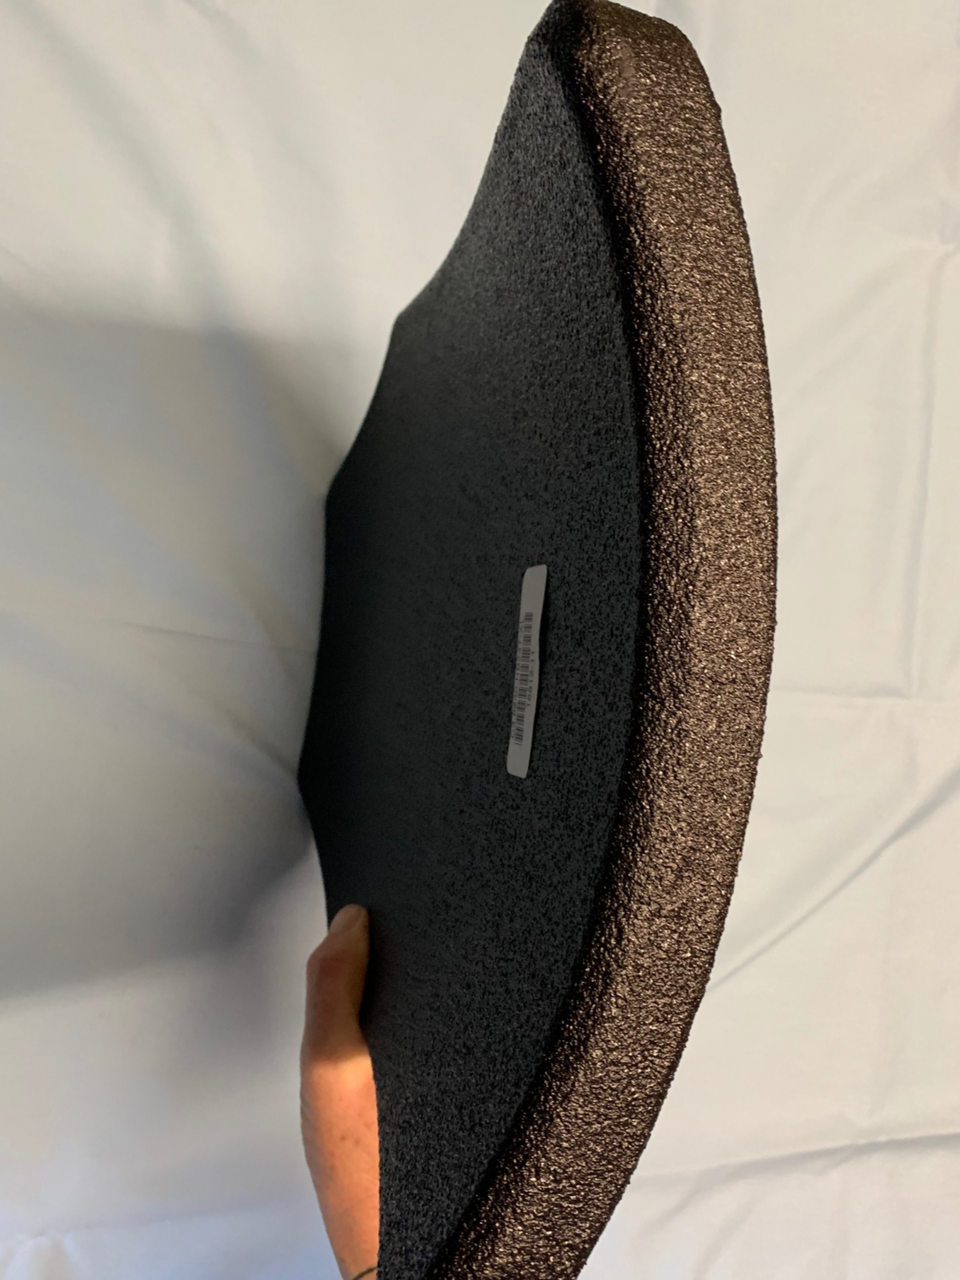 "Level III Lightweight UHMWPE Rifle Plate 10"" x 12"" SAPI"